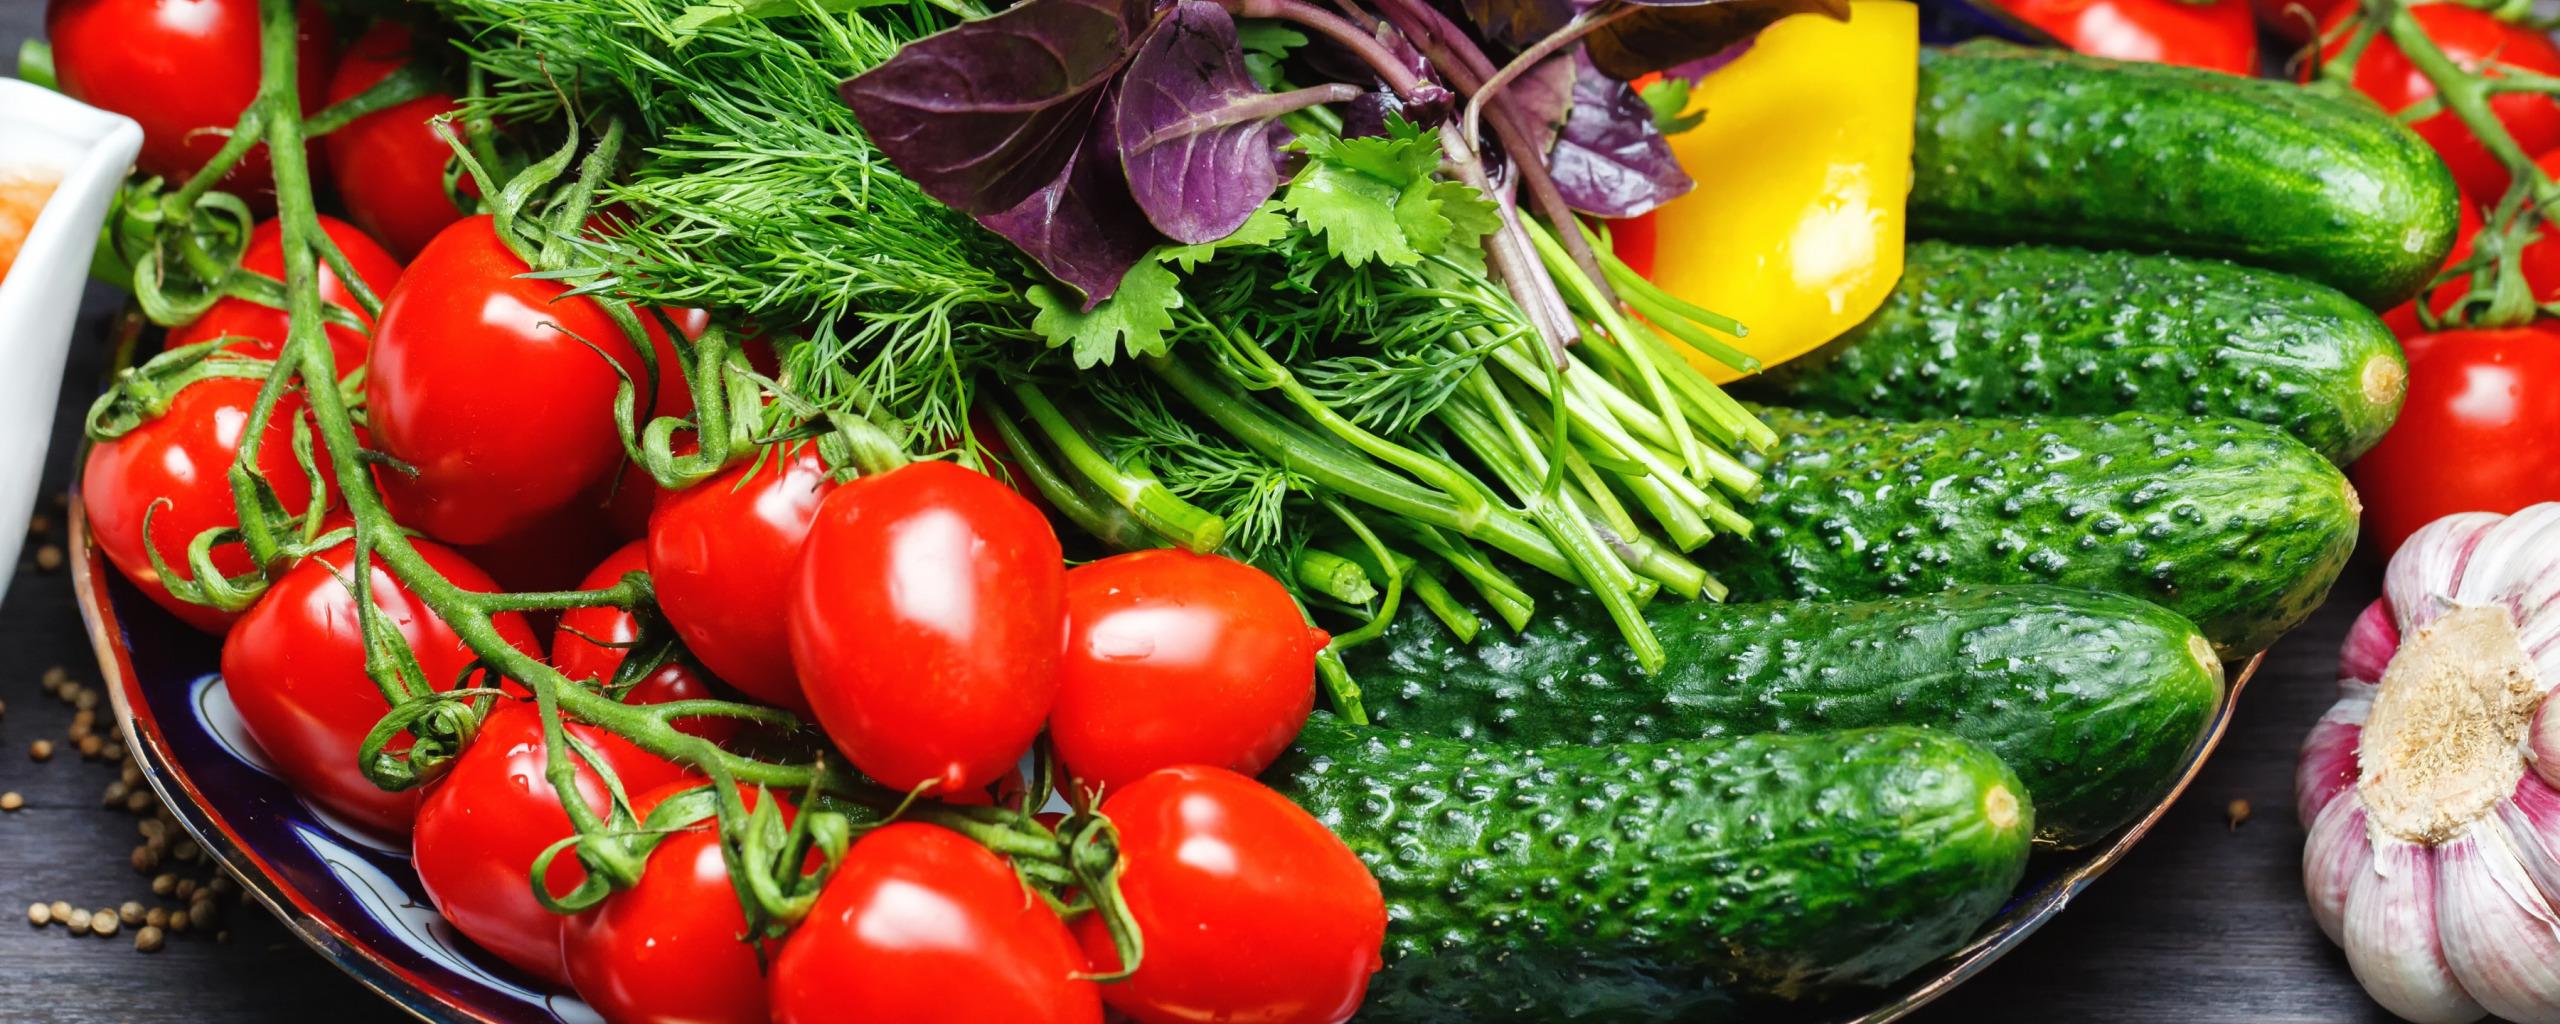 Картинки овощи помидоры огурцы